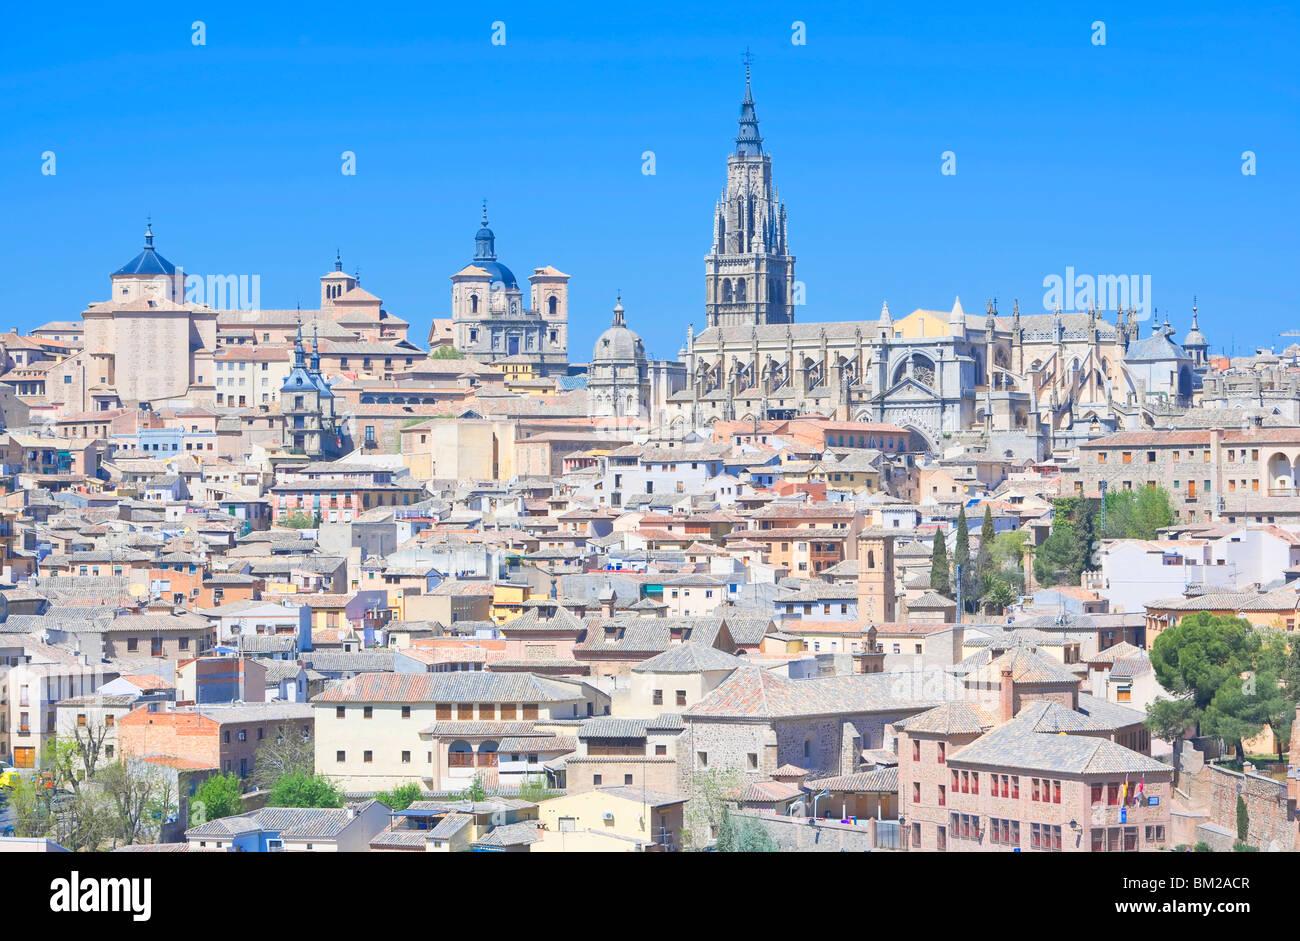 La ville de Toledo, Toledo, UNESCO World Heritage Site, Castille La Manche, Espagne Photo Stock